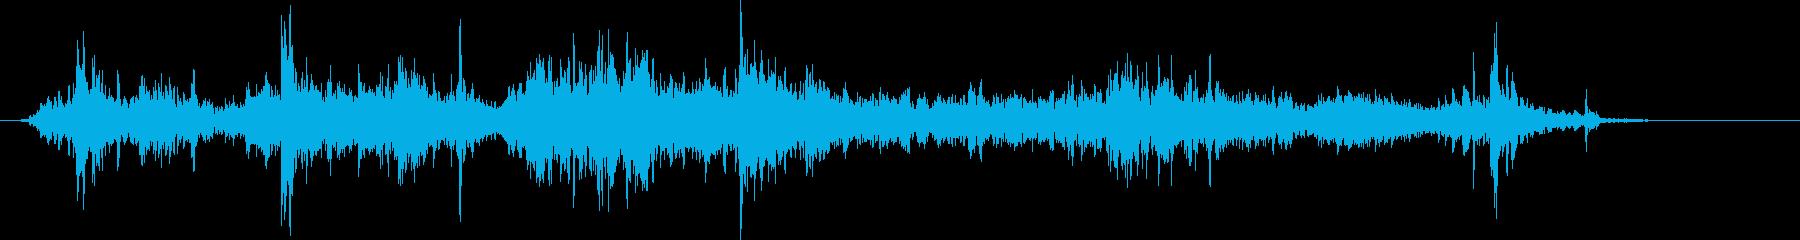 ket:残響クリプト、木箱、コンテ...の再生済みの波形